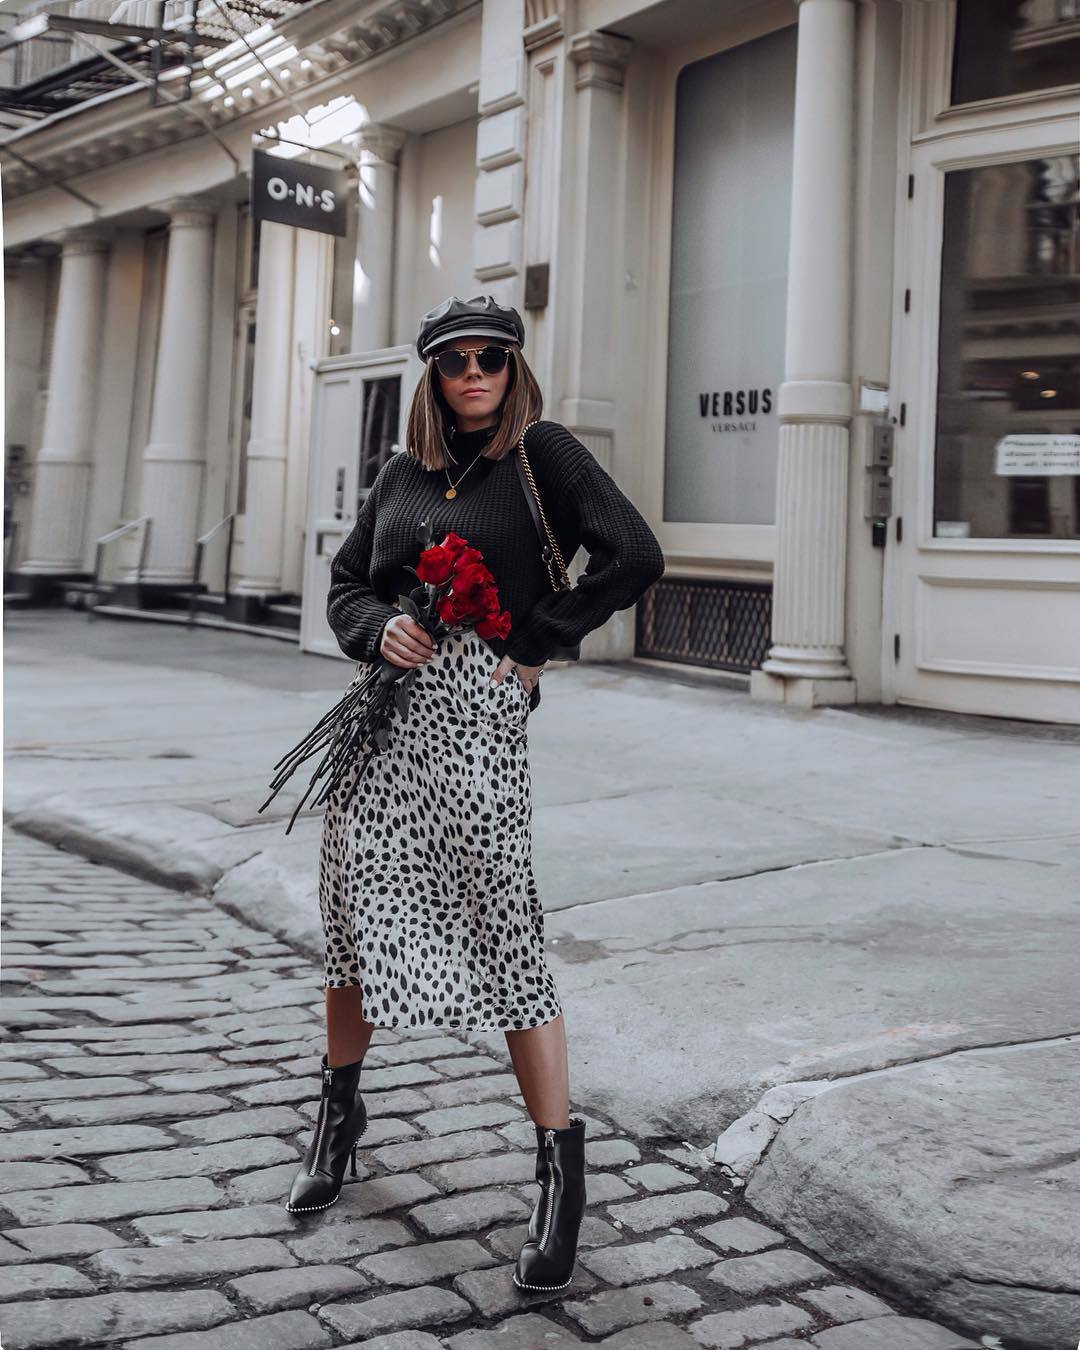 skirt midi skirt black and white leopard print high waisted skirt black boots heel boots ankle boots black sweater shoulder bag beret